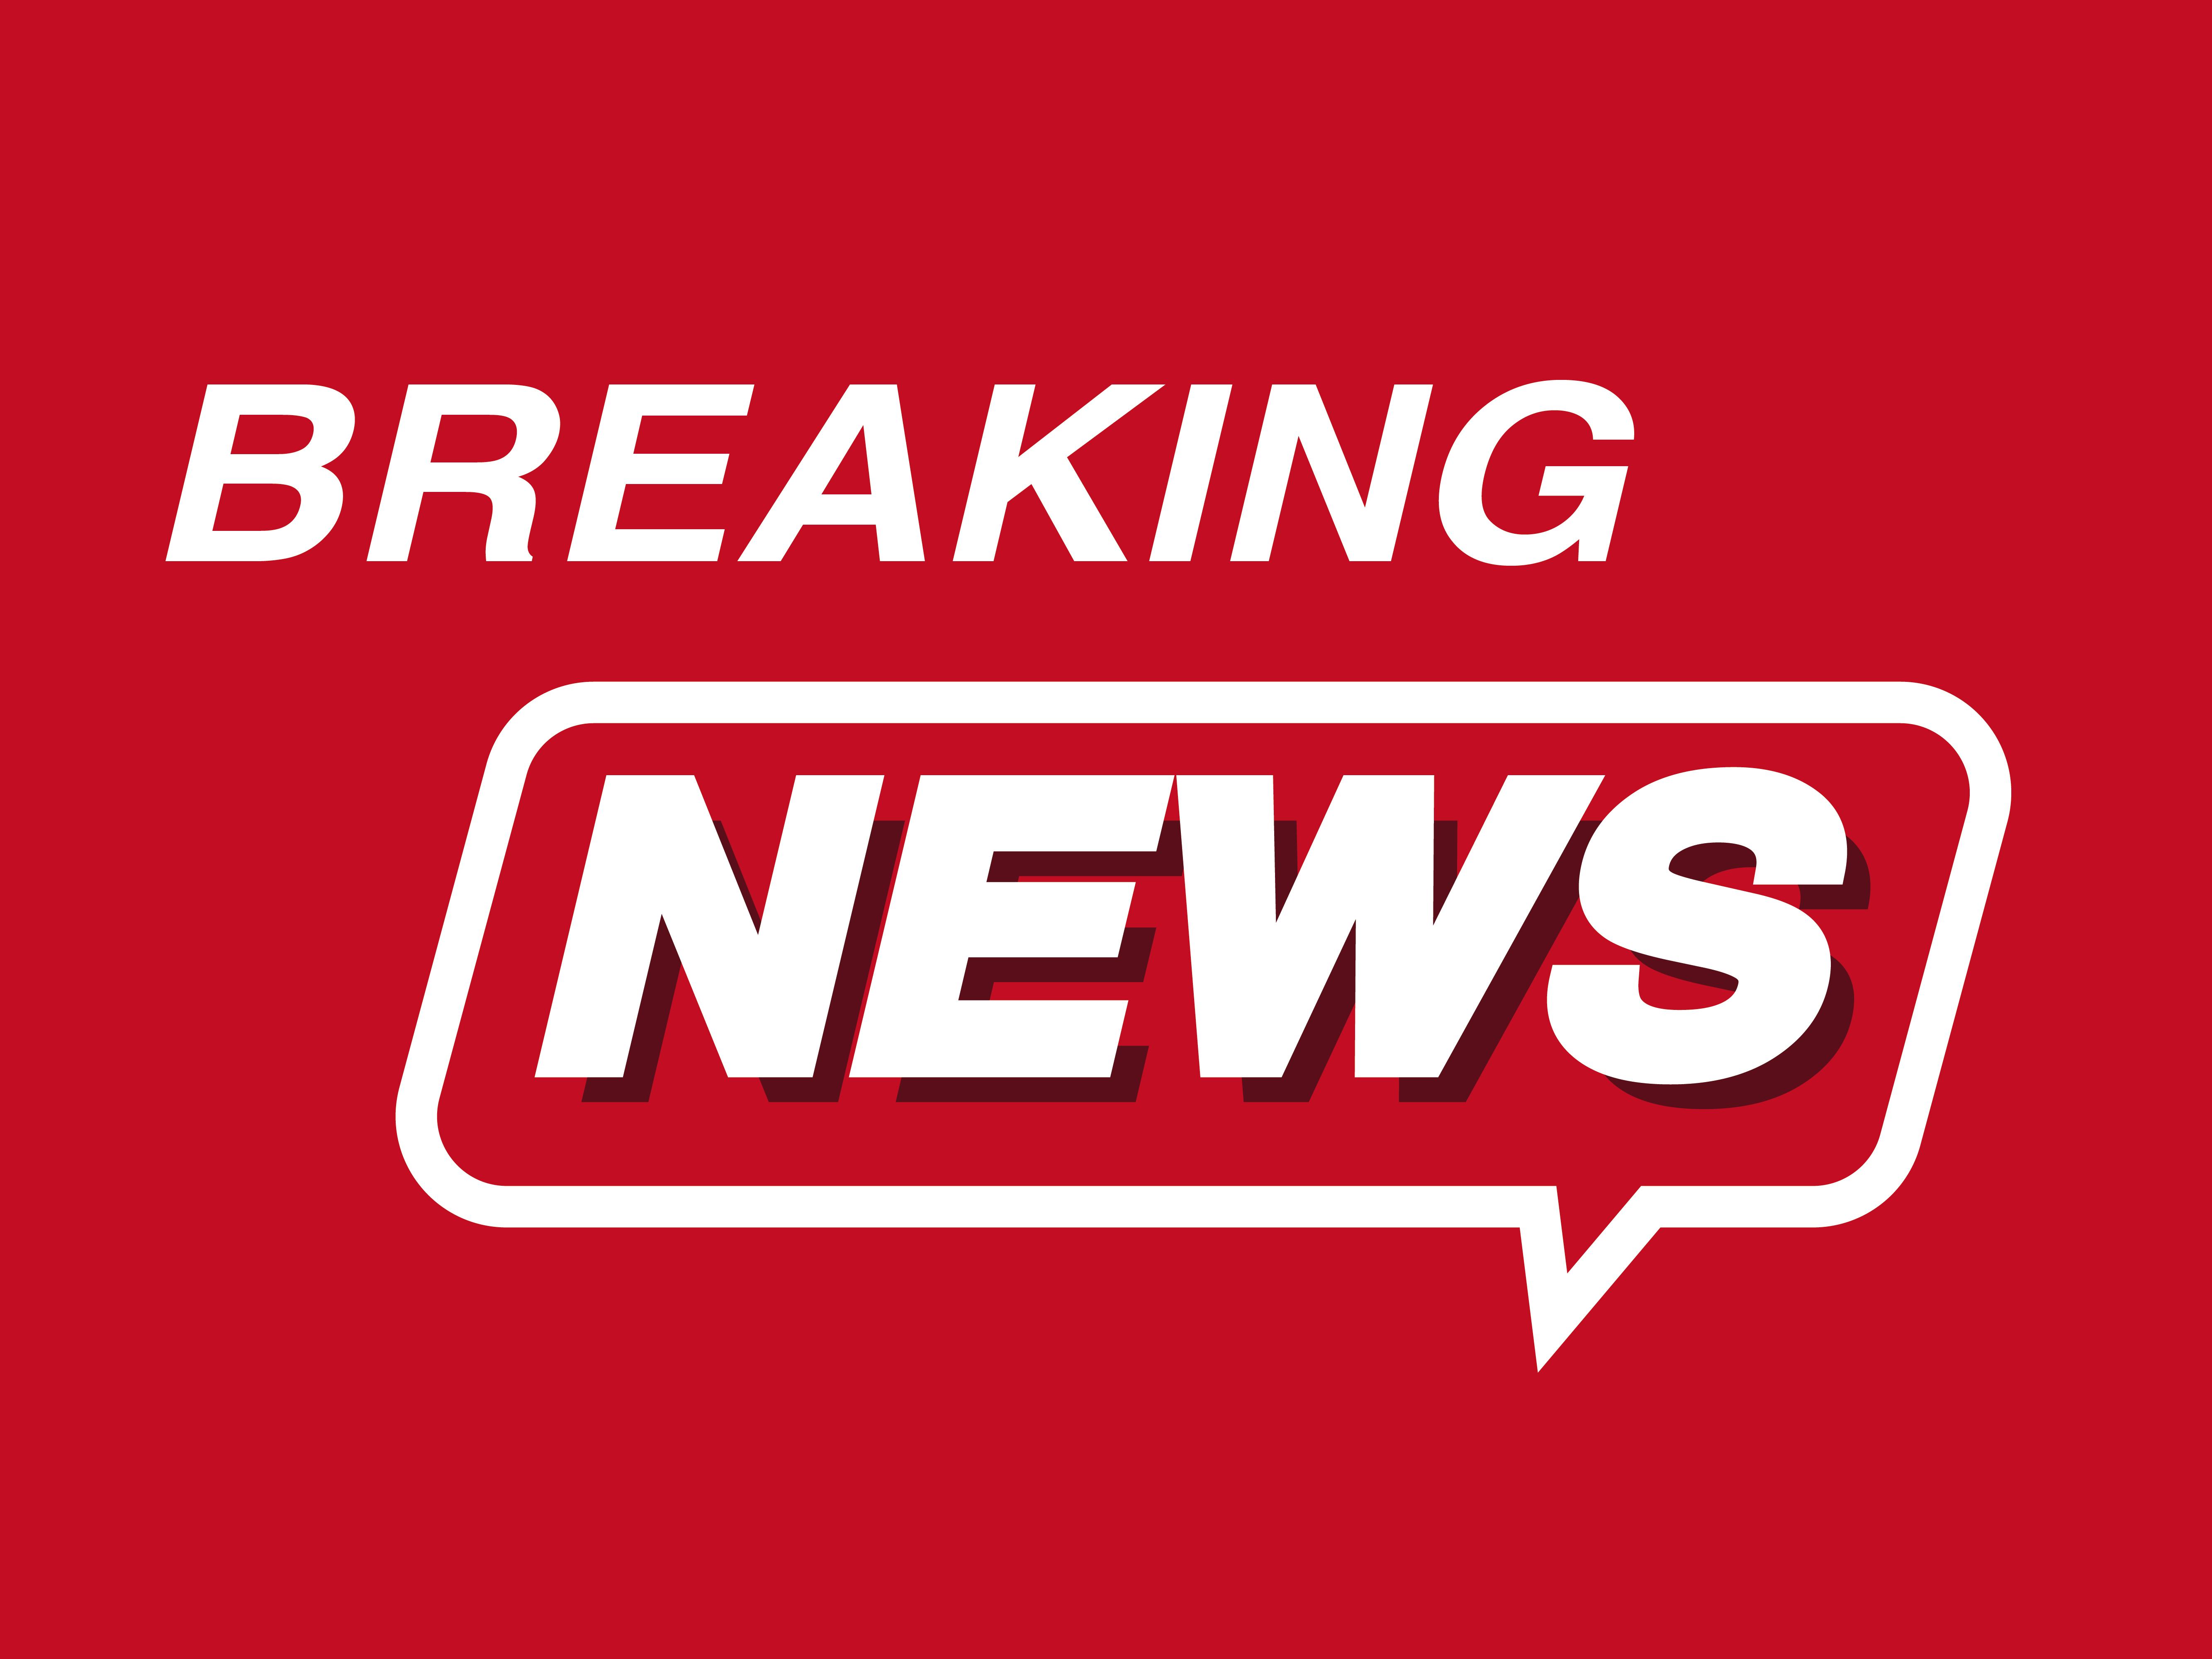 6.0-magnitude quake strikes off western Indonesia